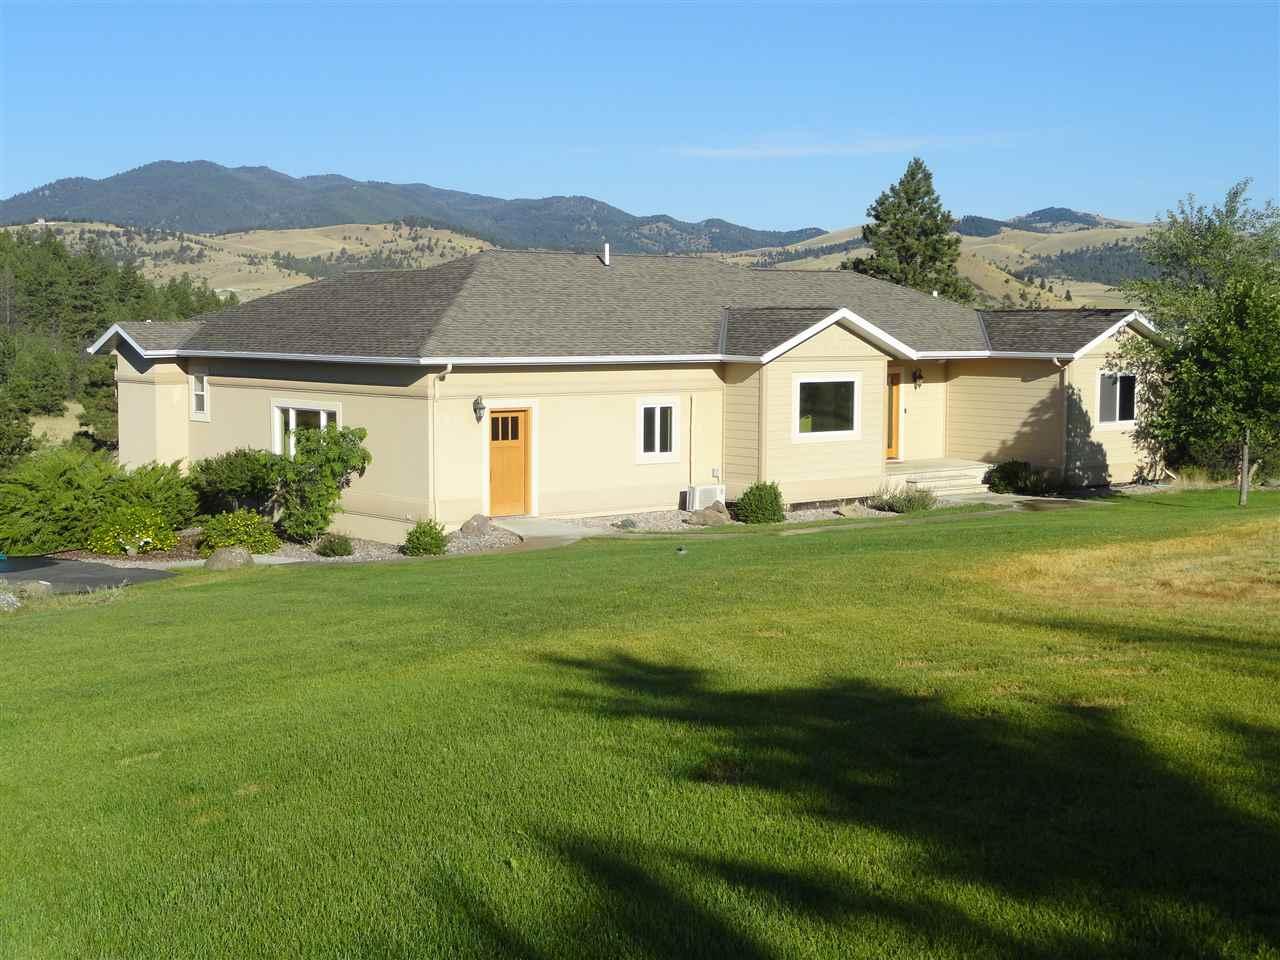 Real Estate for Sale, ListingId: 34608145, Clancy,MT59634